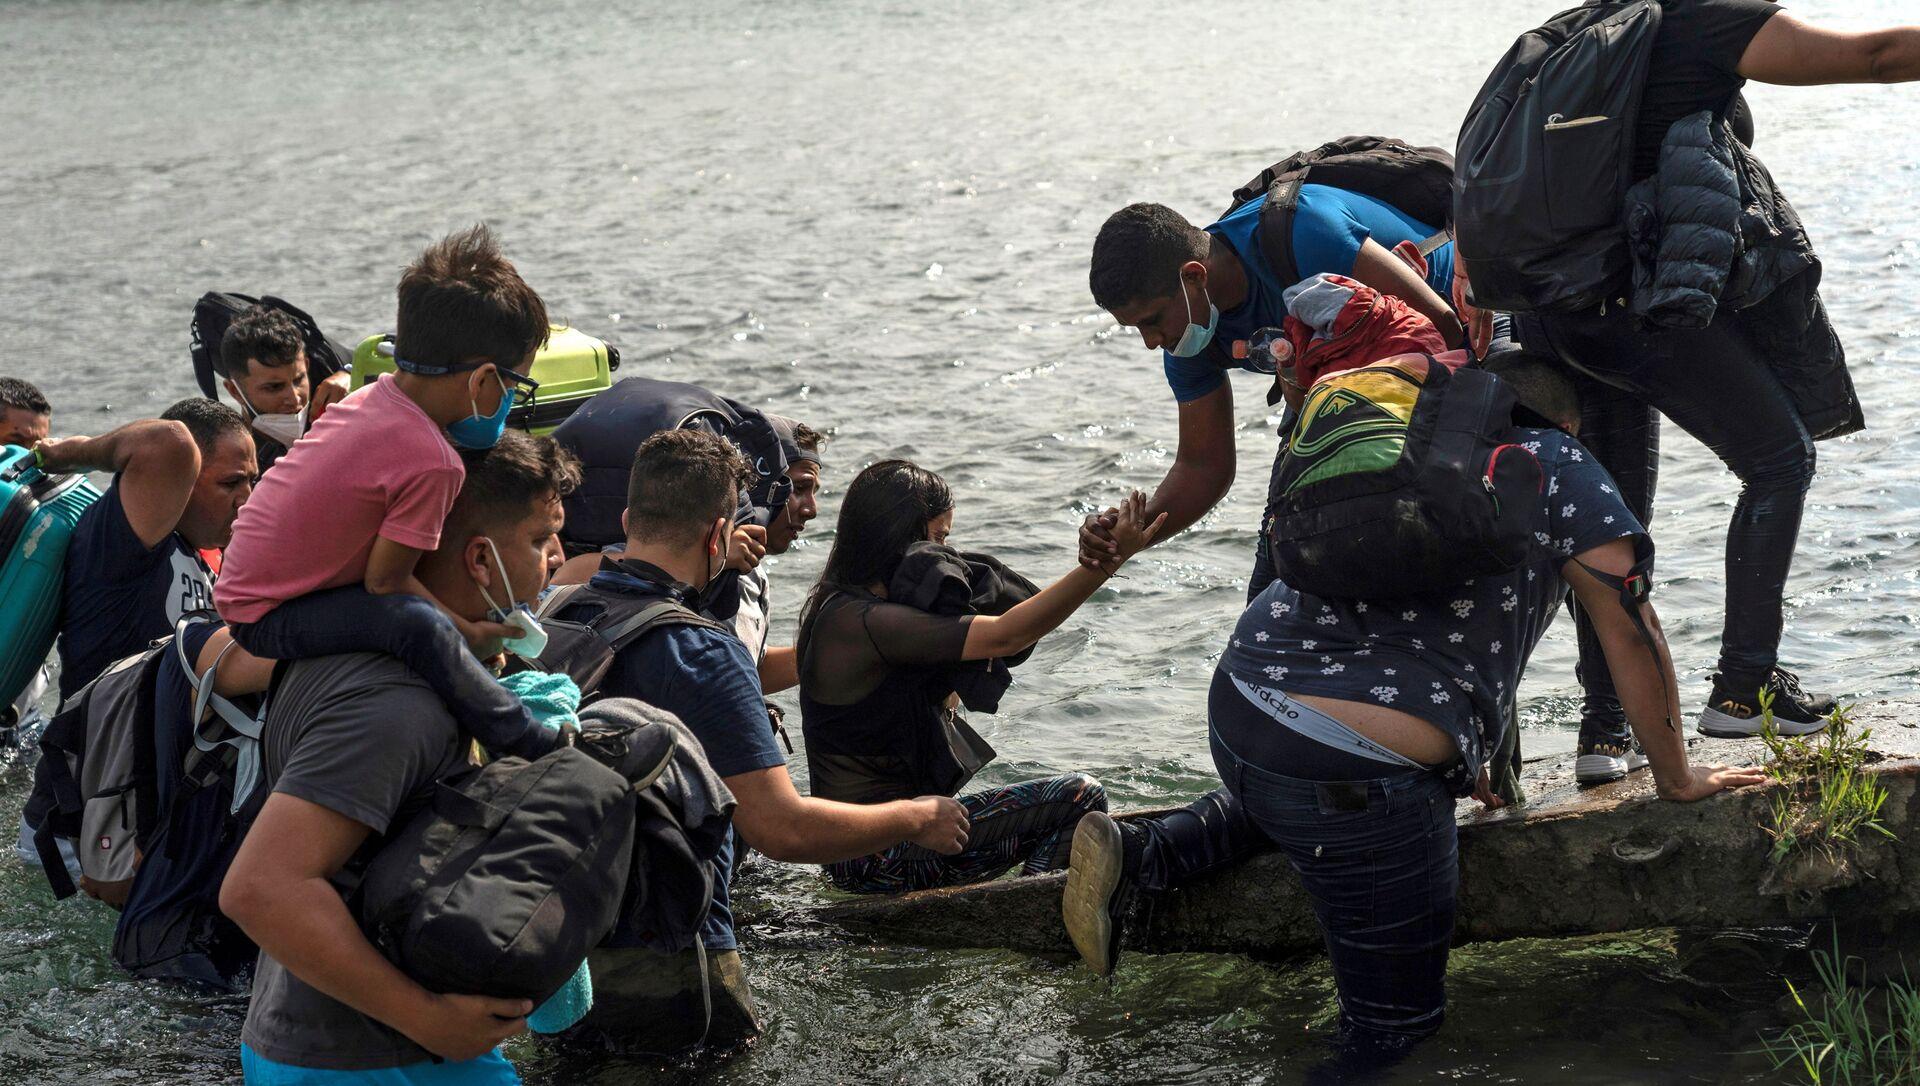 Asylum-seeking migrants cross the Rio Grande river in Del Rio - Sputnik International, 1920, 28.05.2021